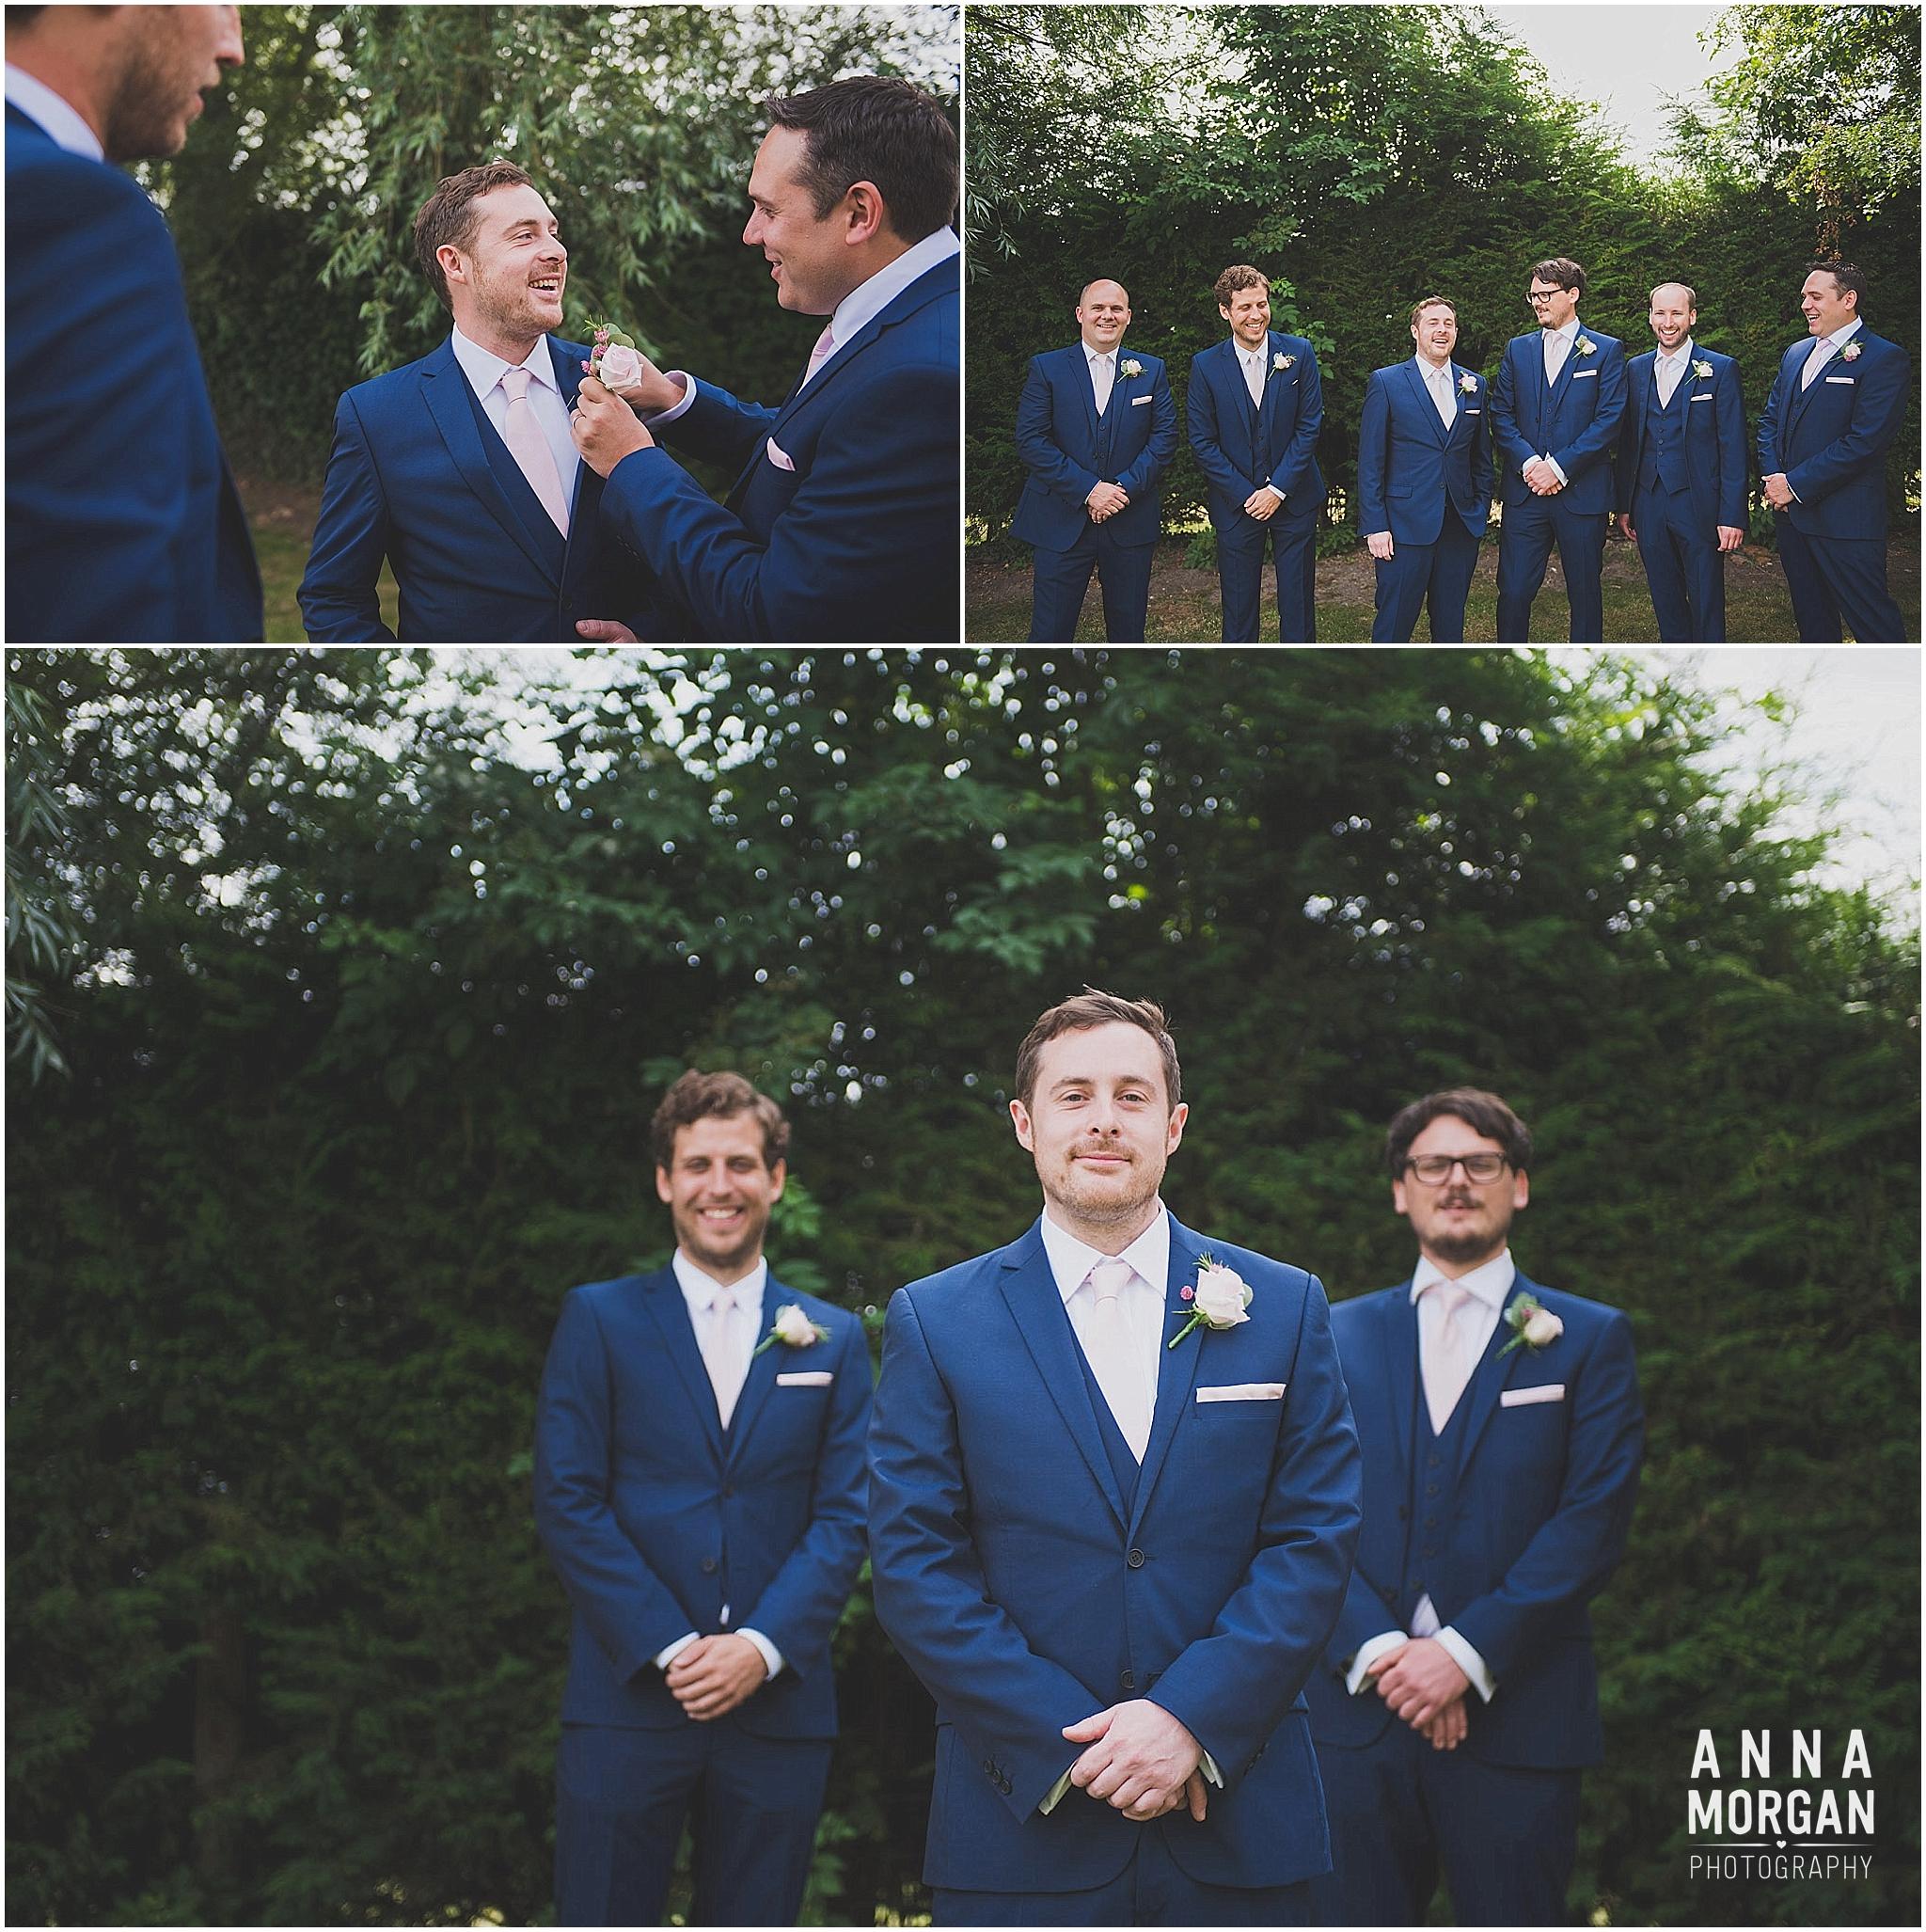 Horsebridge Station Wedding Becky & Freddie Anna Morgan Photography-5